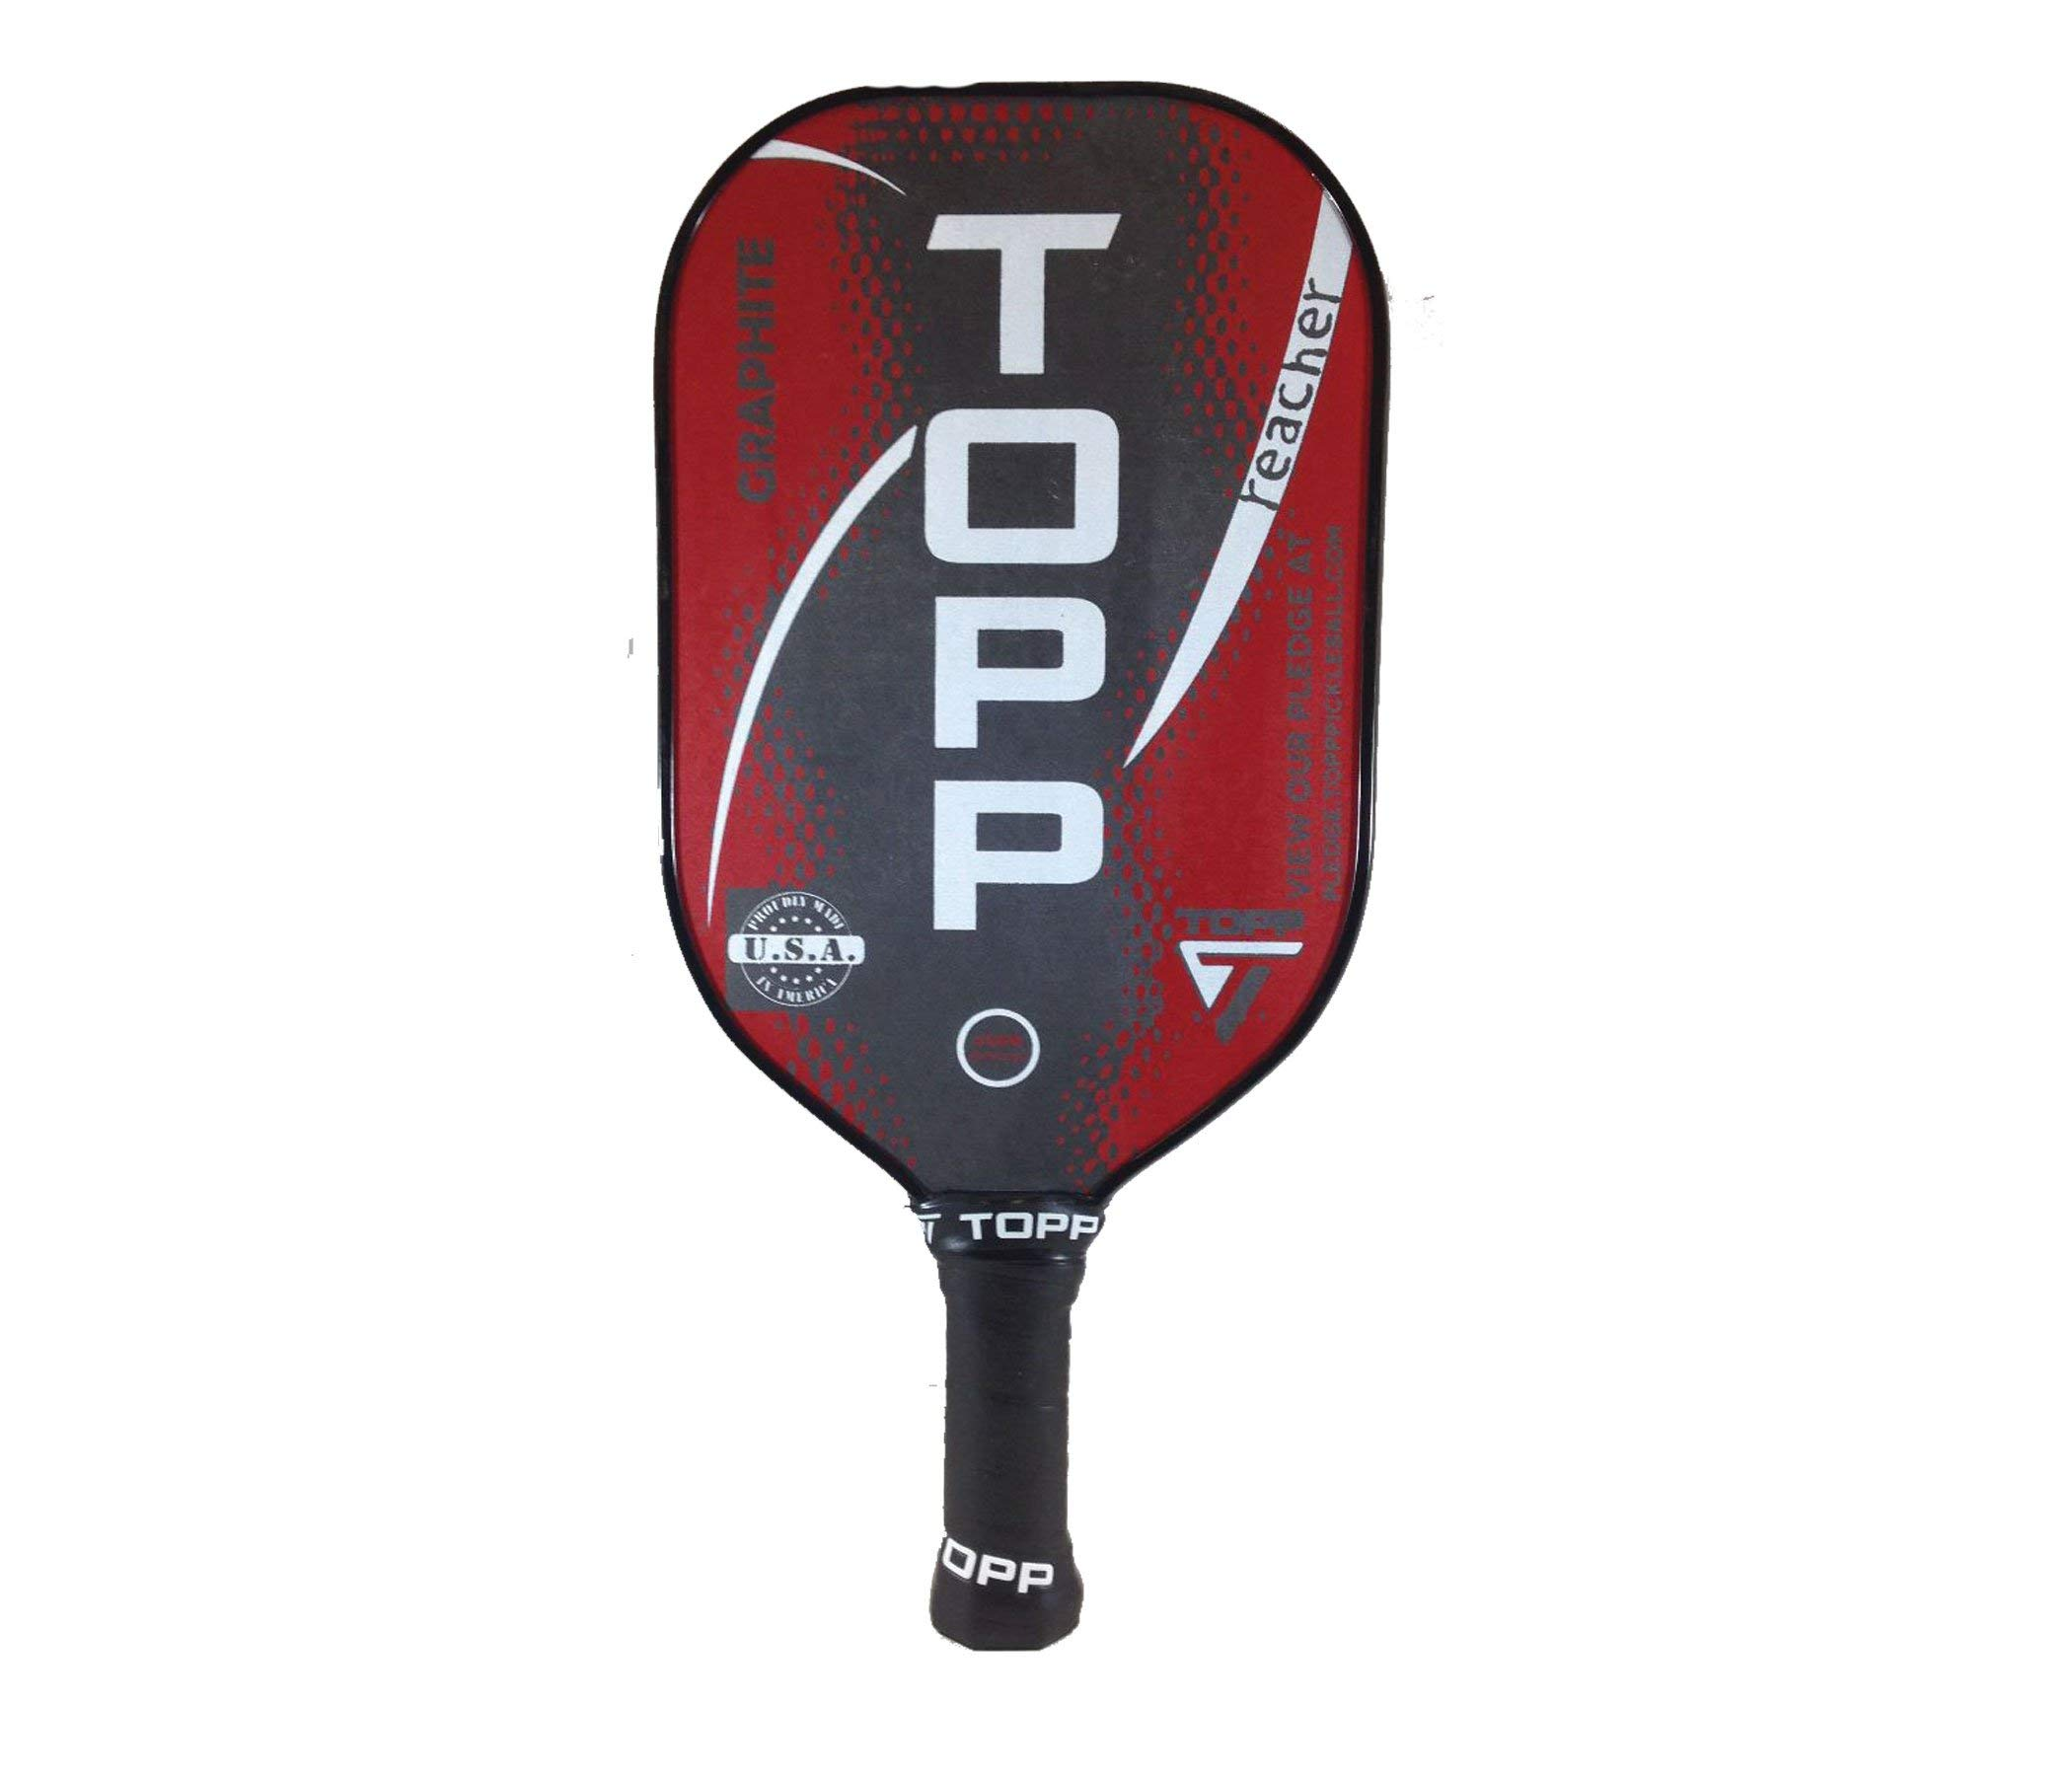 Topp Pickleball Paddle Reacher Graphite Blade -4D2M